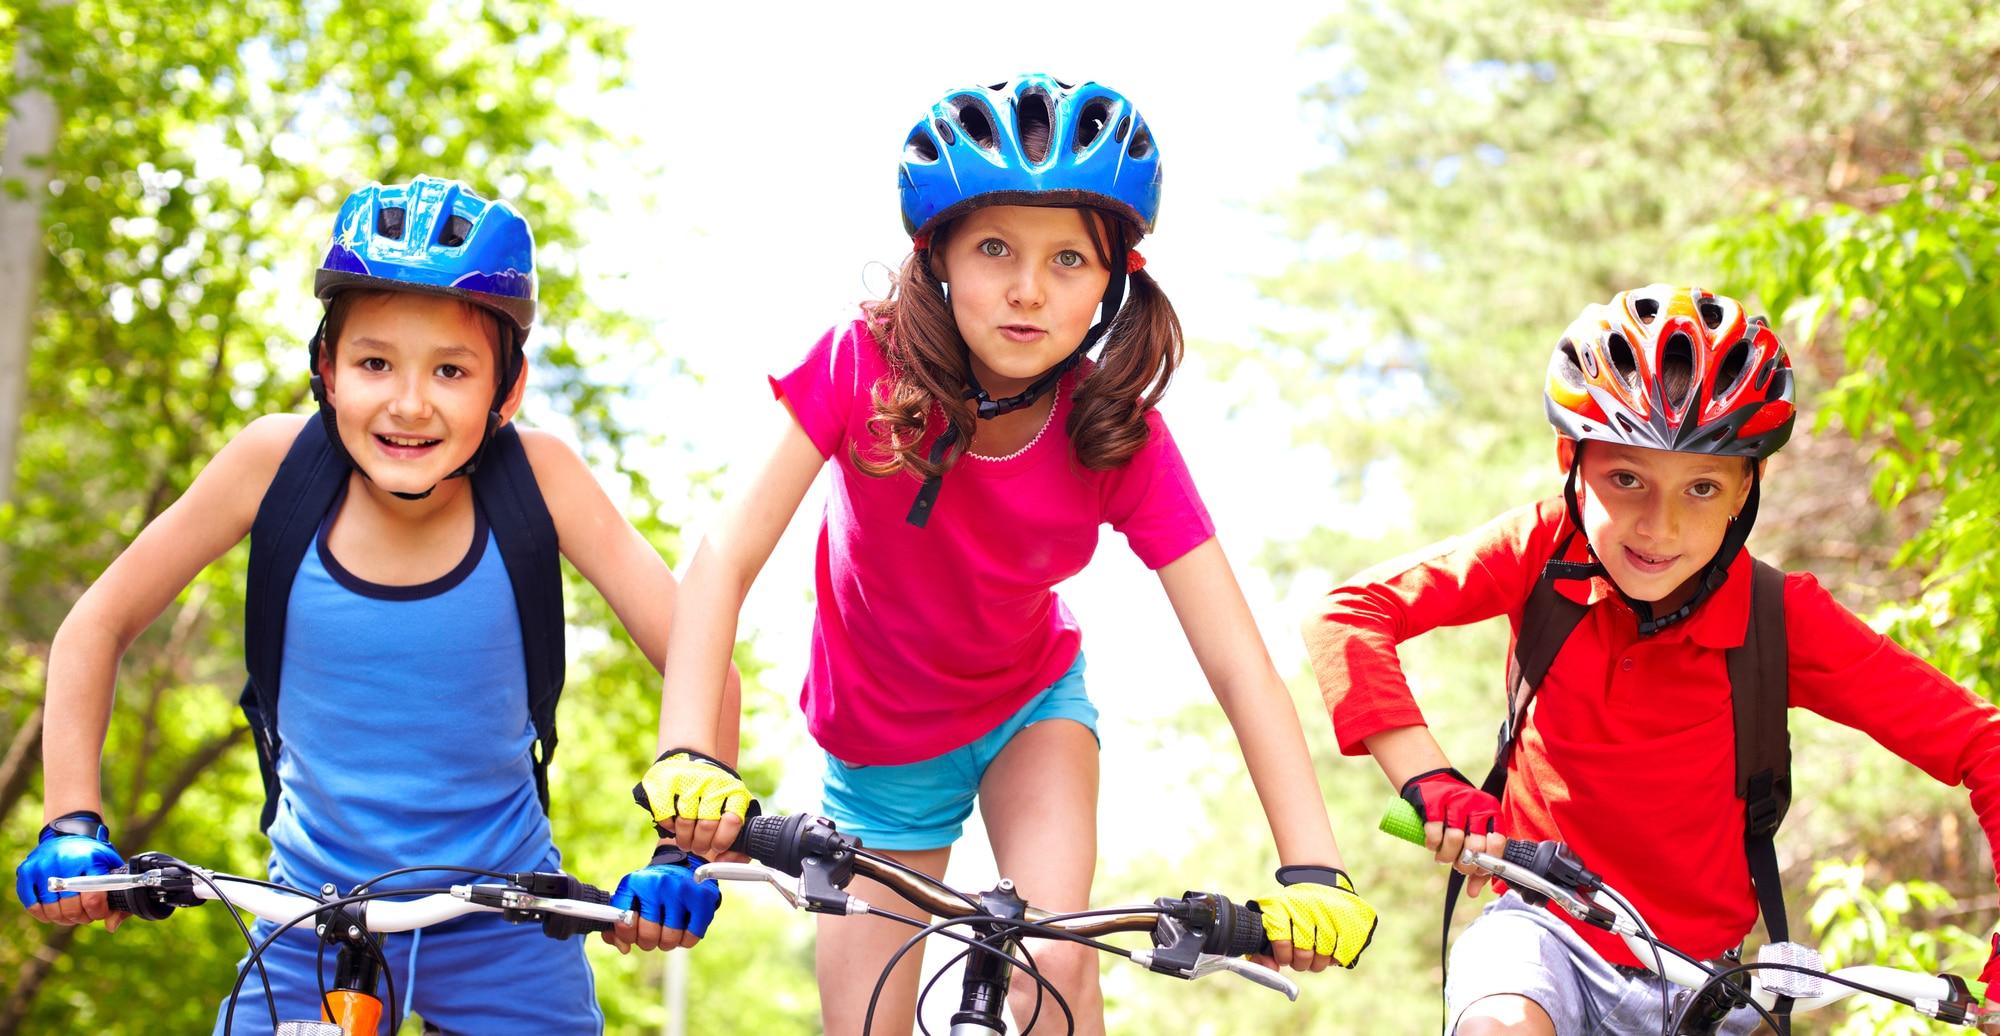 Cykelhjelm test til børn